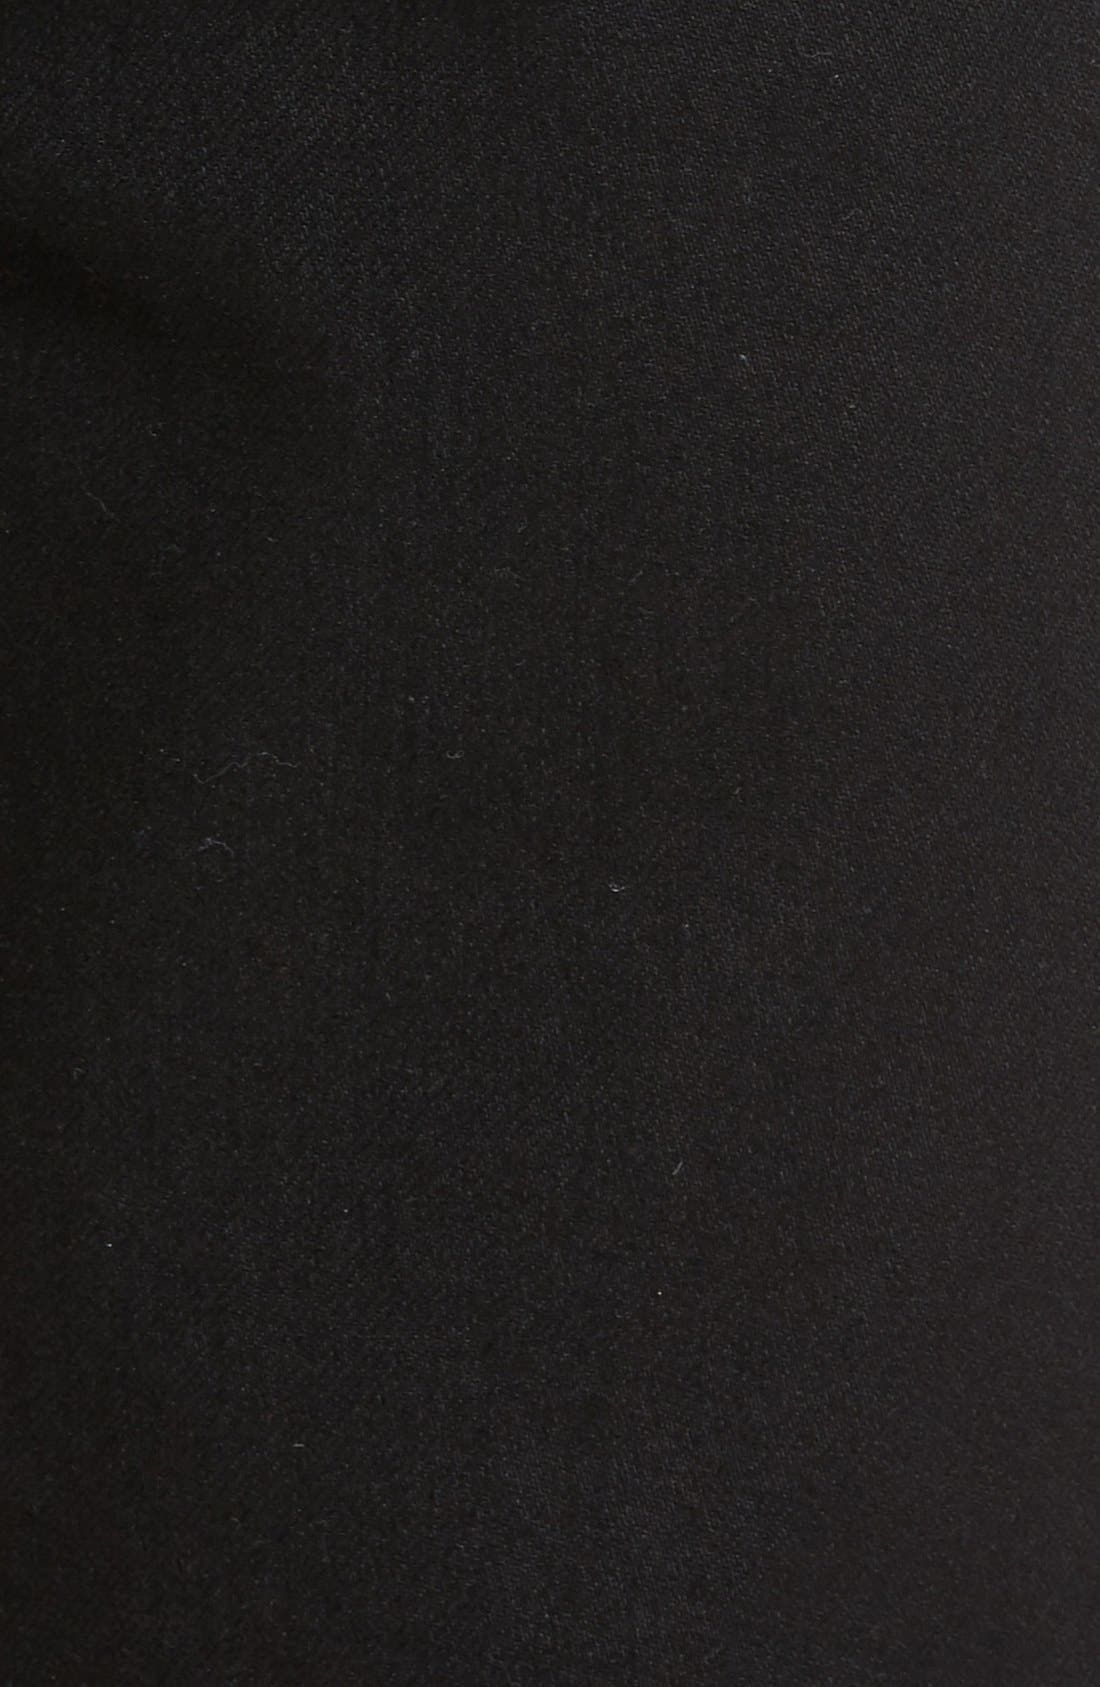 Slimmy Slim Fit Jeans,                             Alternate thumbnail 5, color,                             Towne Black